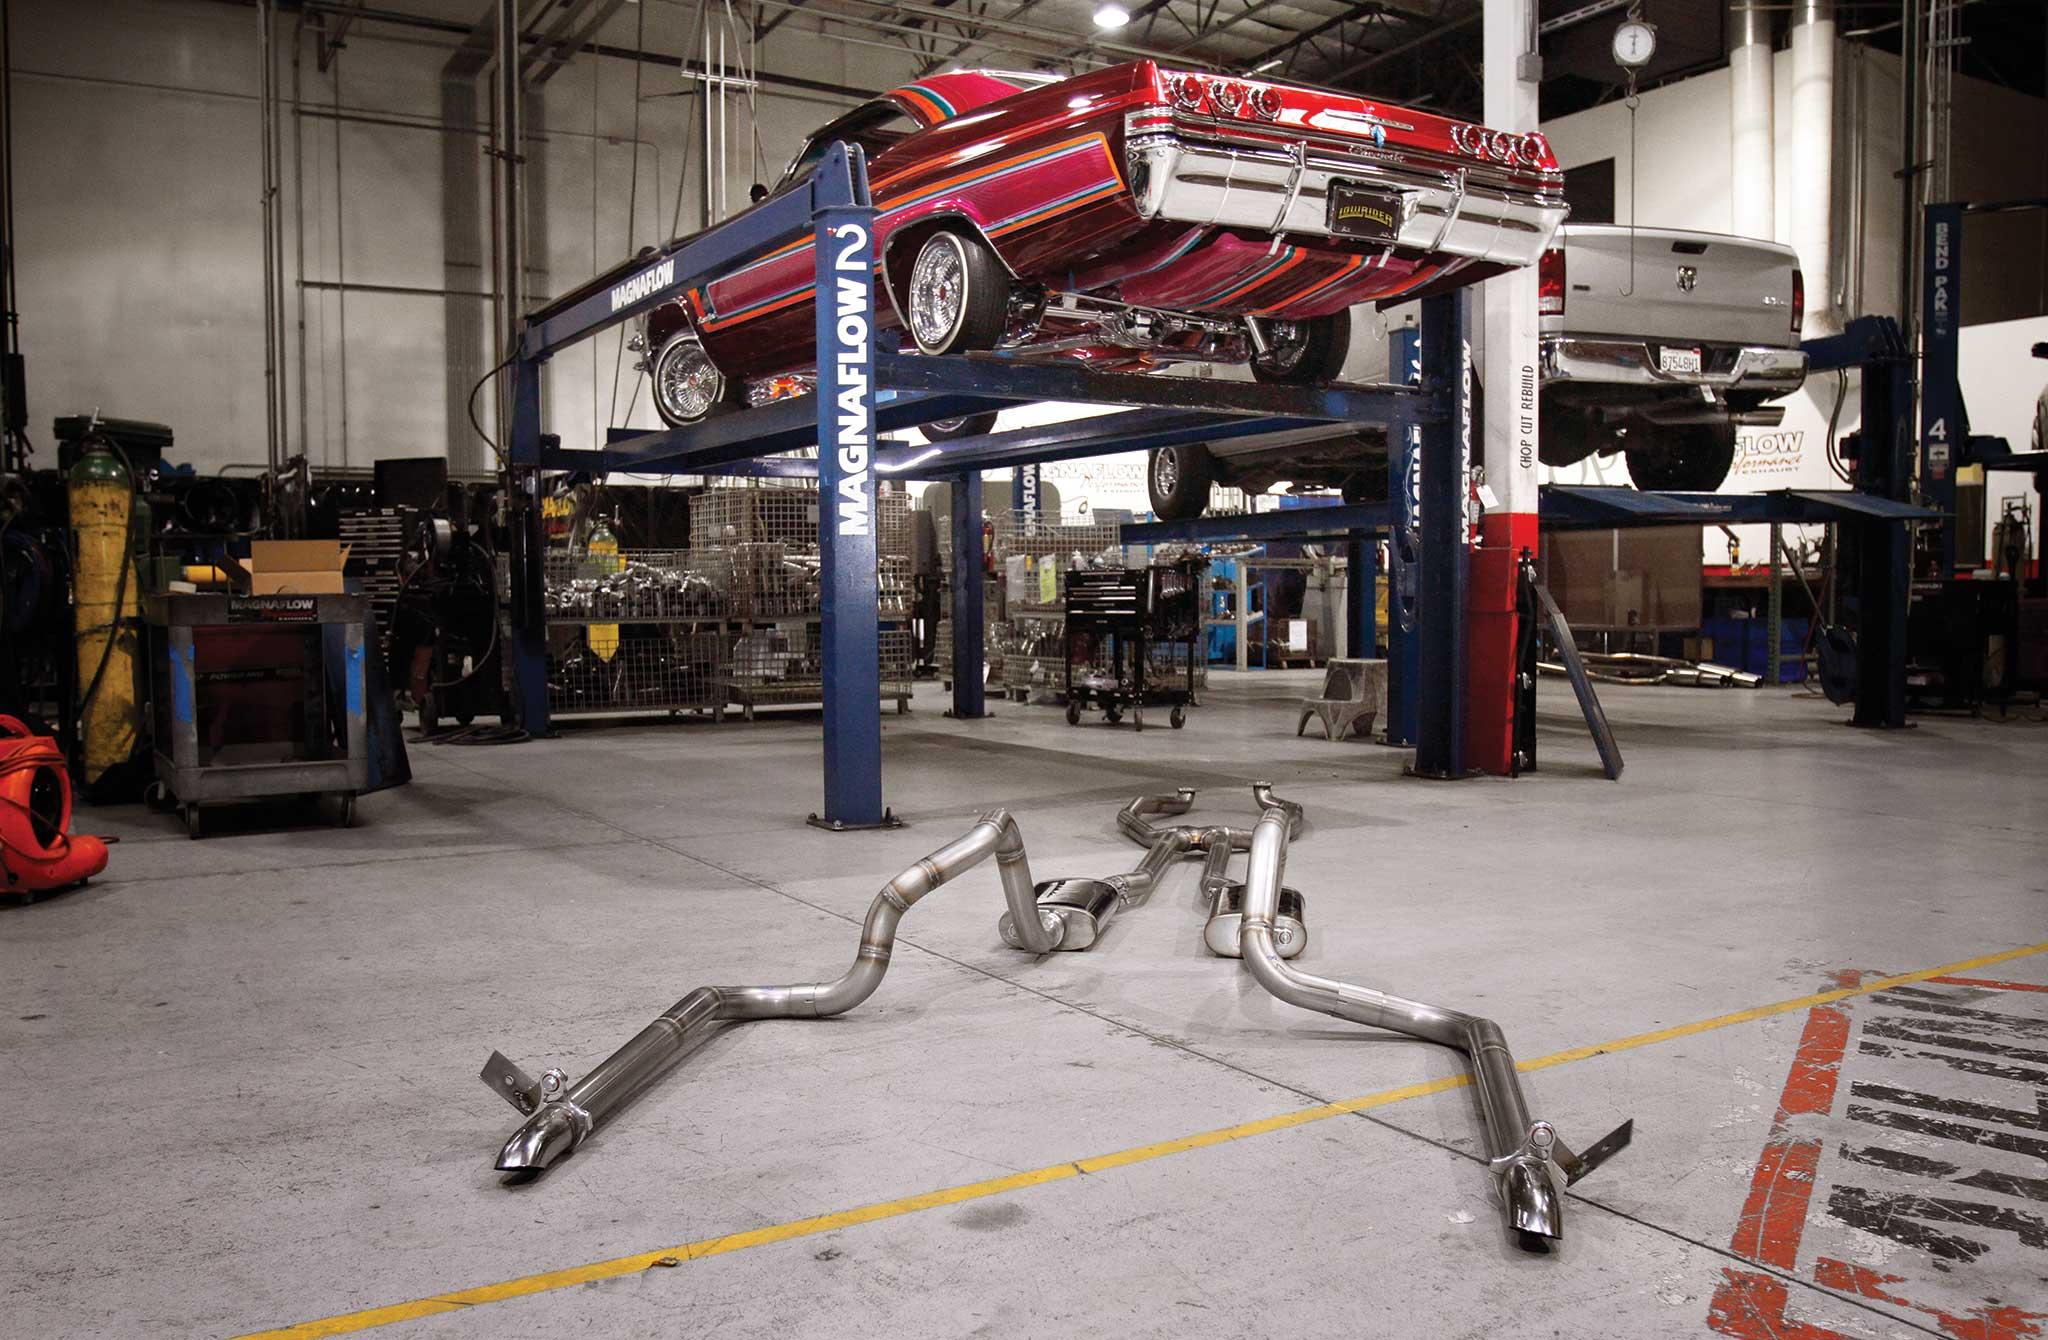 001 magnaflow exhaust install 65 impala